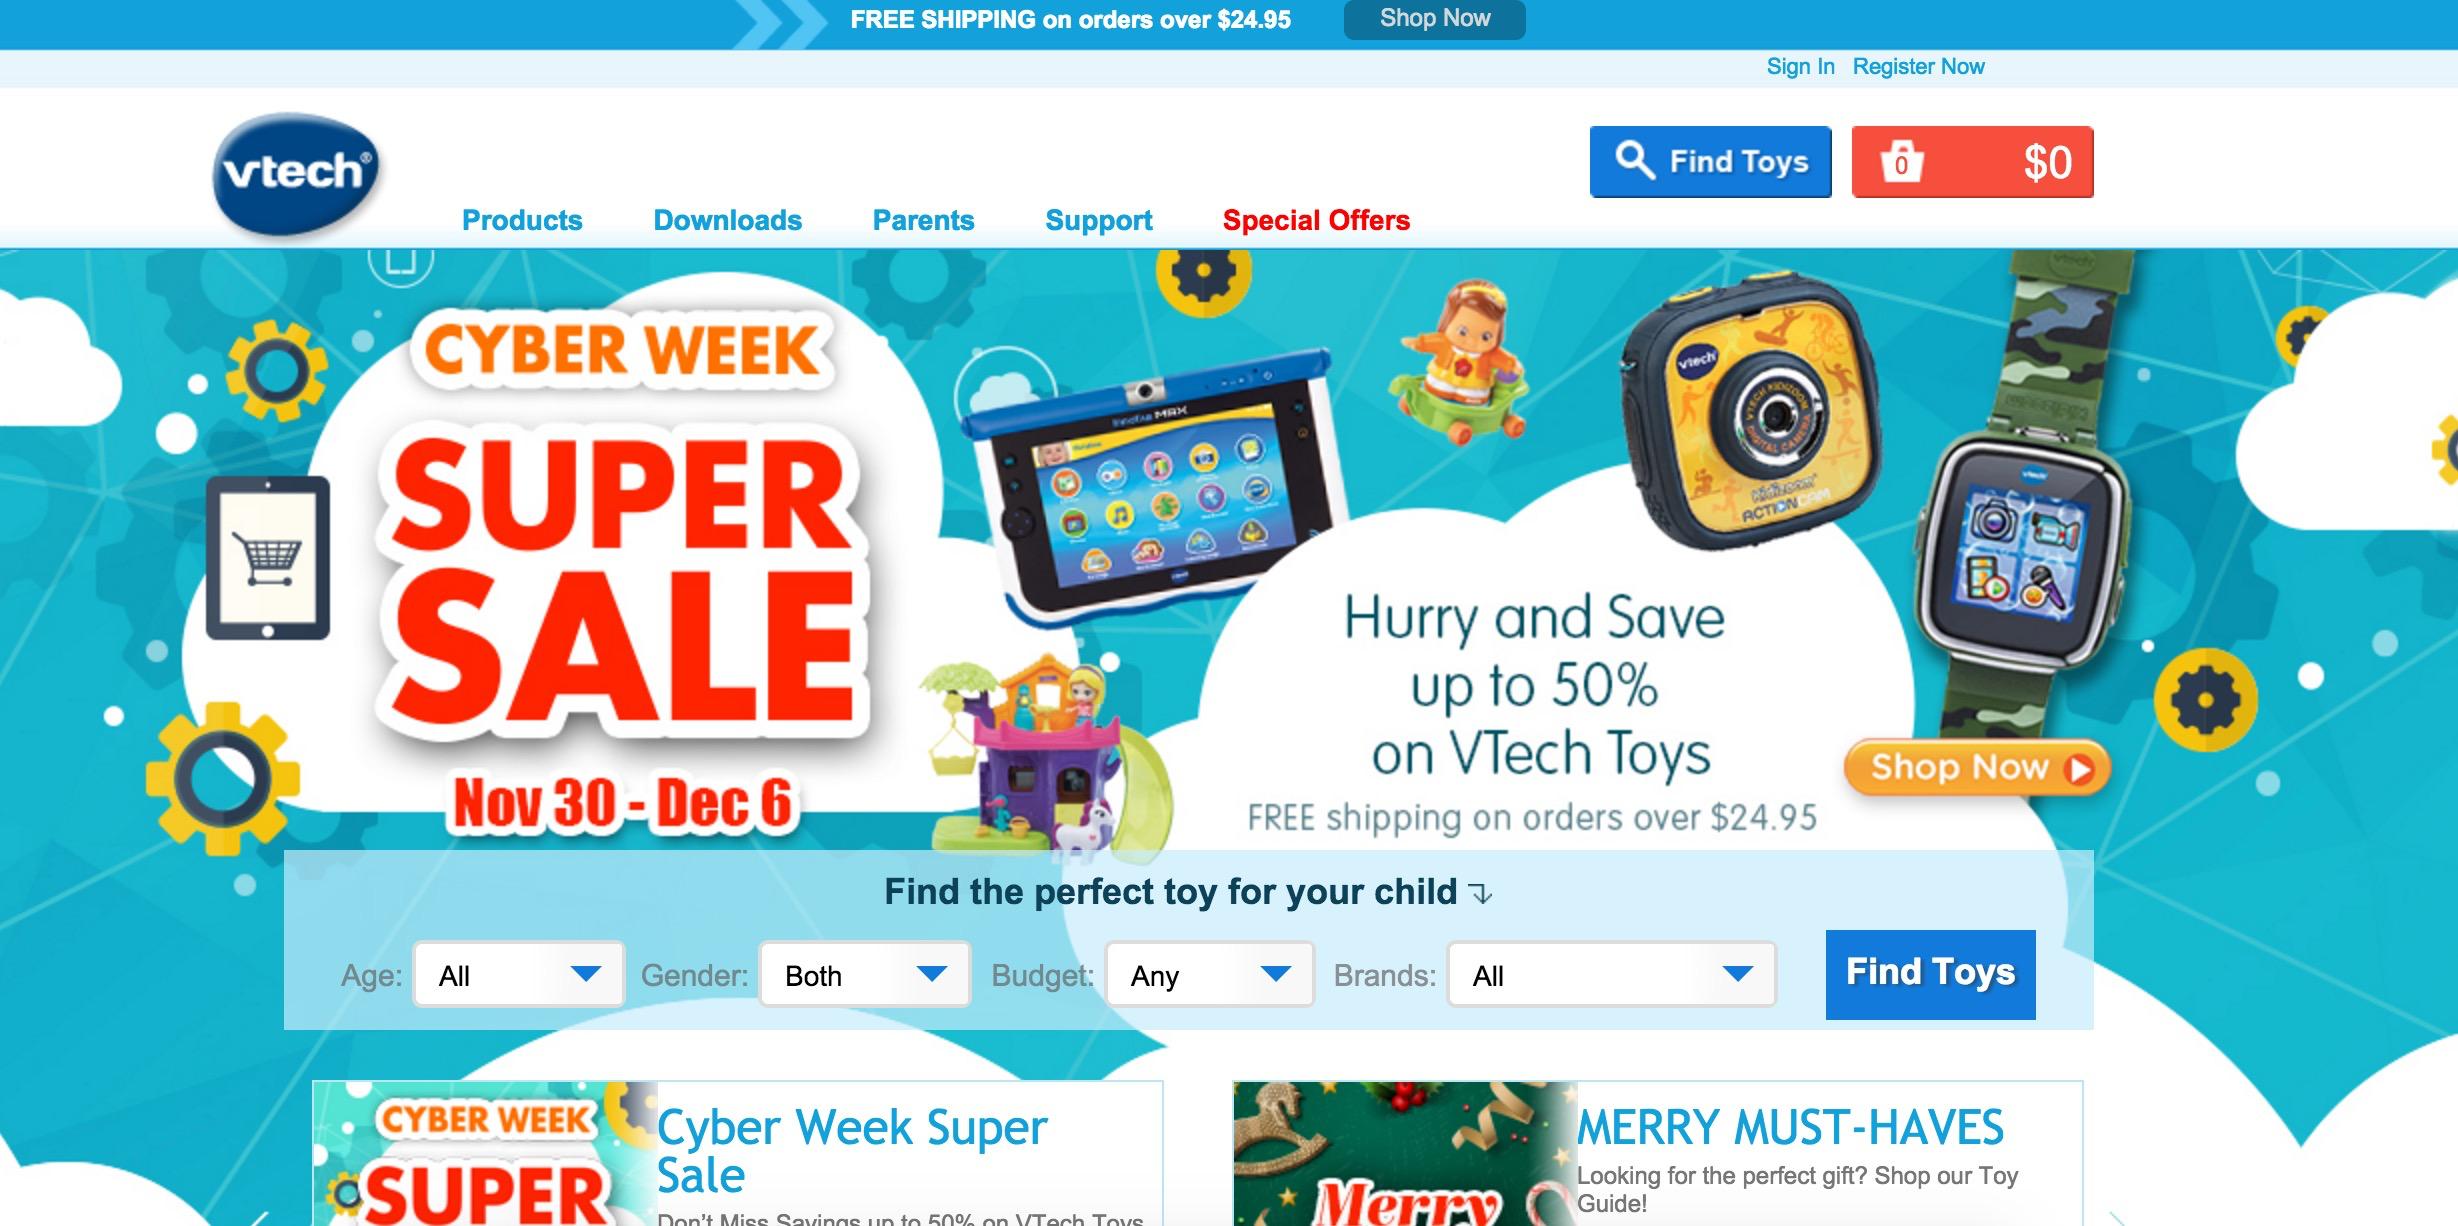 5 Million VTech accounts hacked – kids' data exposed